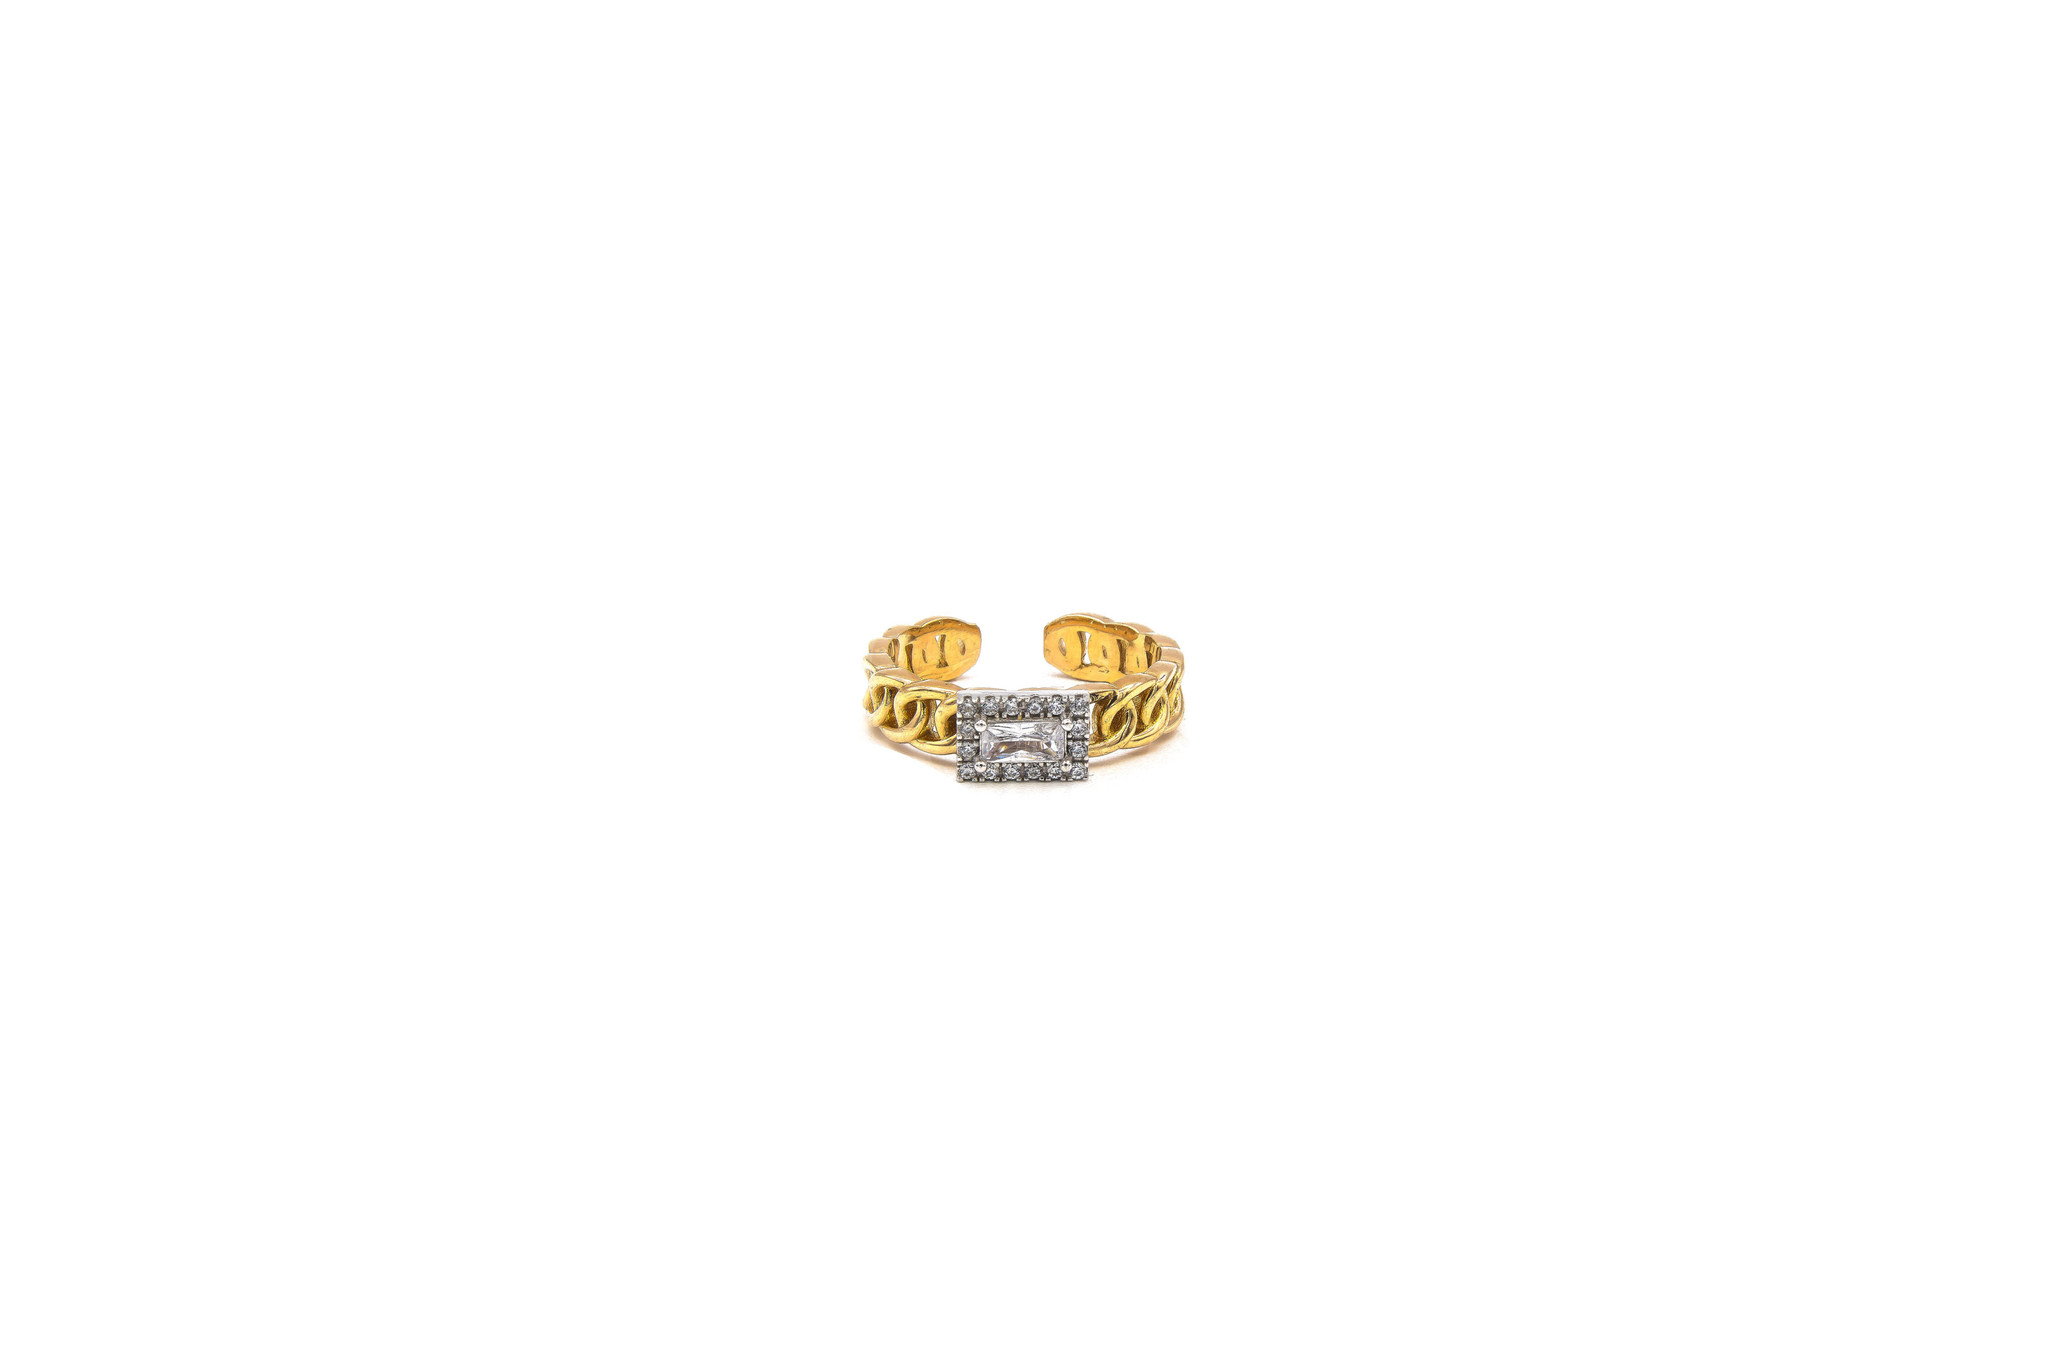 Ring rose schakel met vierkante witte steen bicolor-1